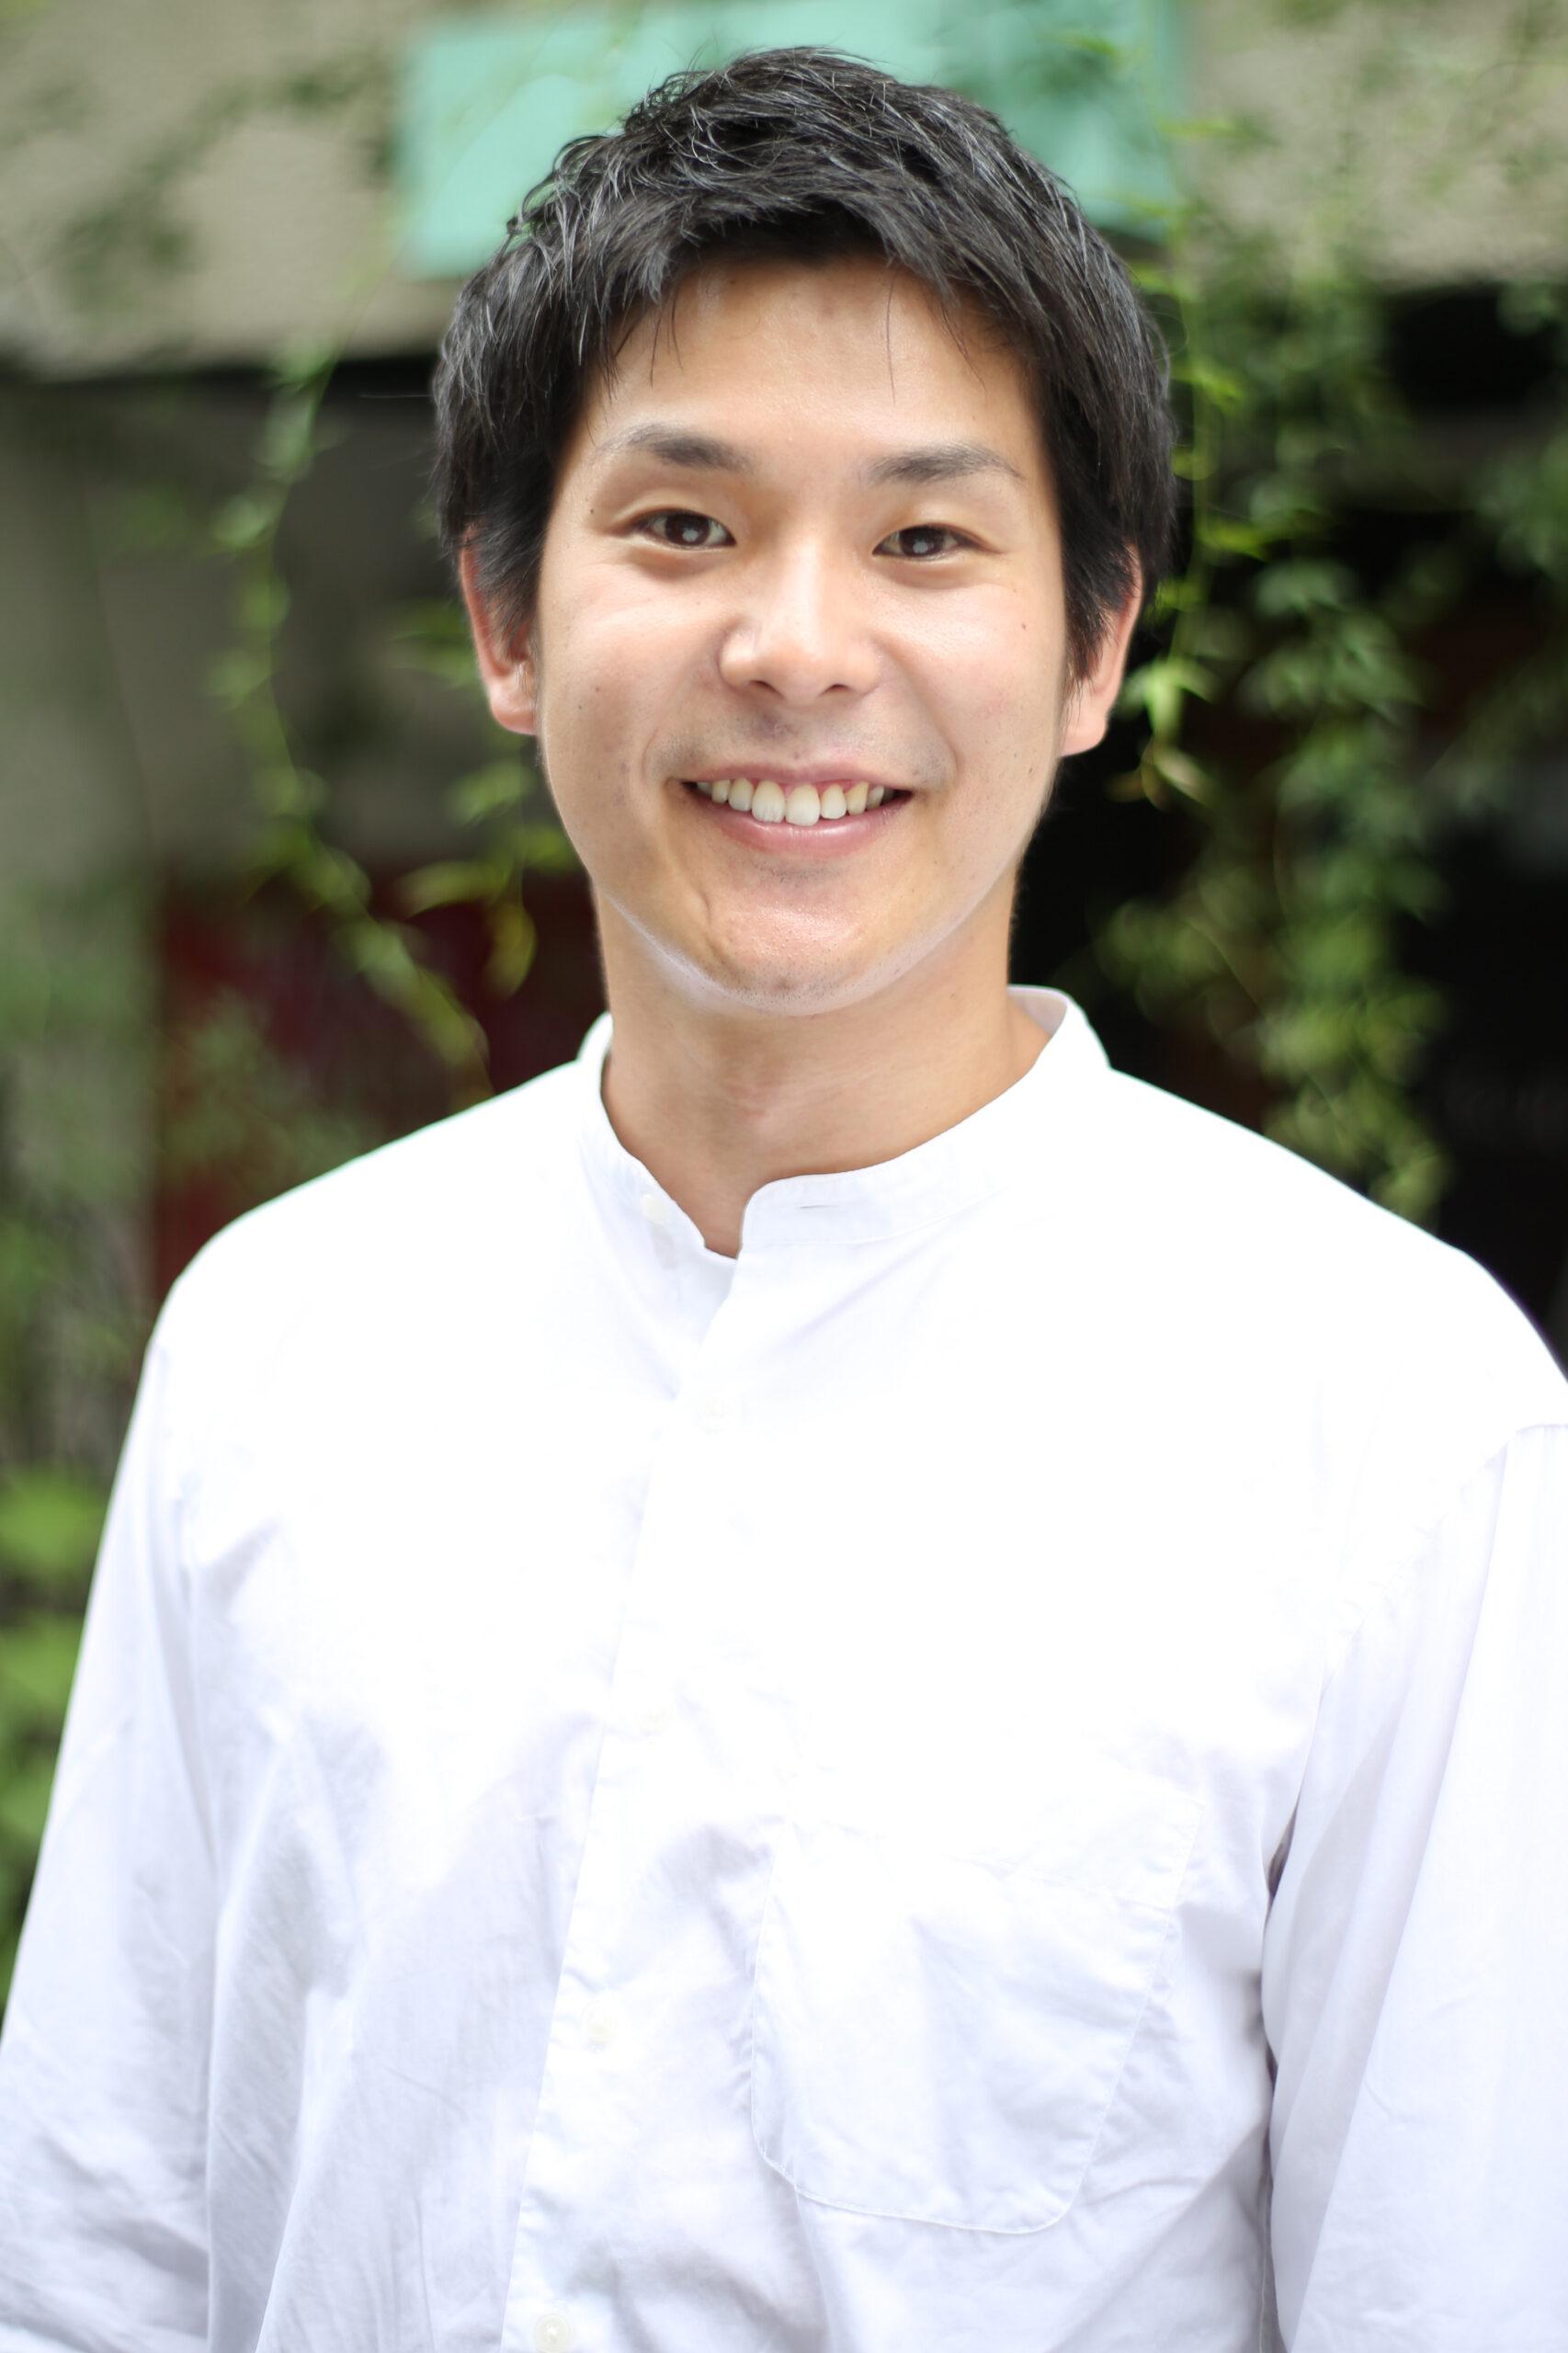 石見 海人 Kaito Iwami